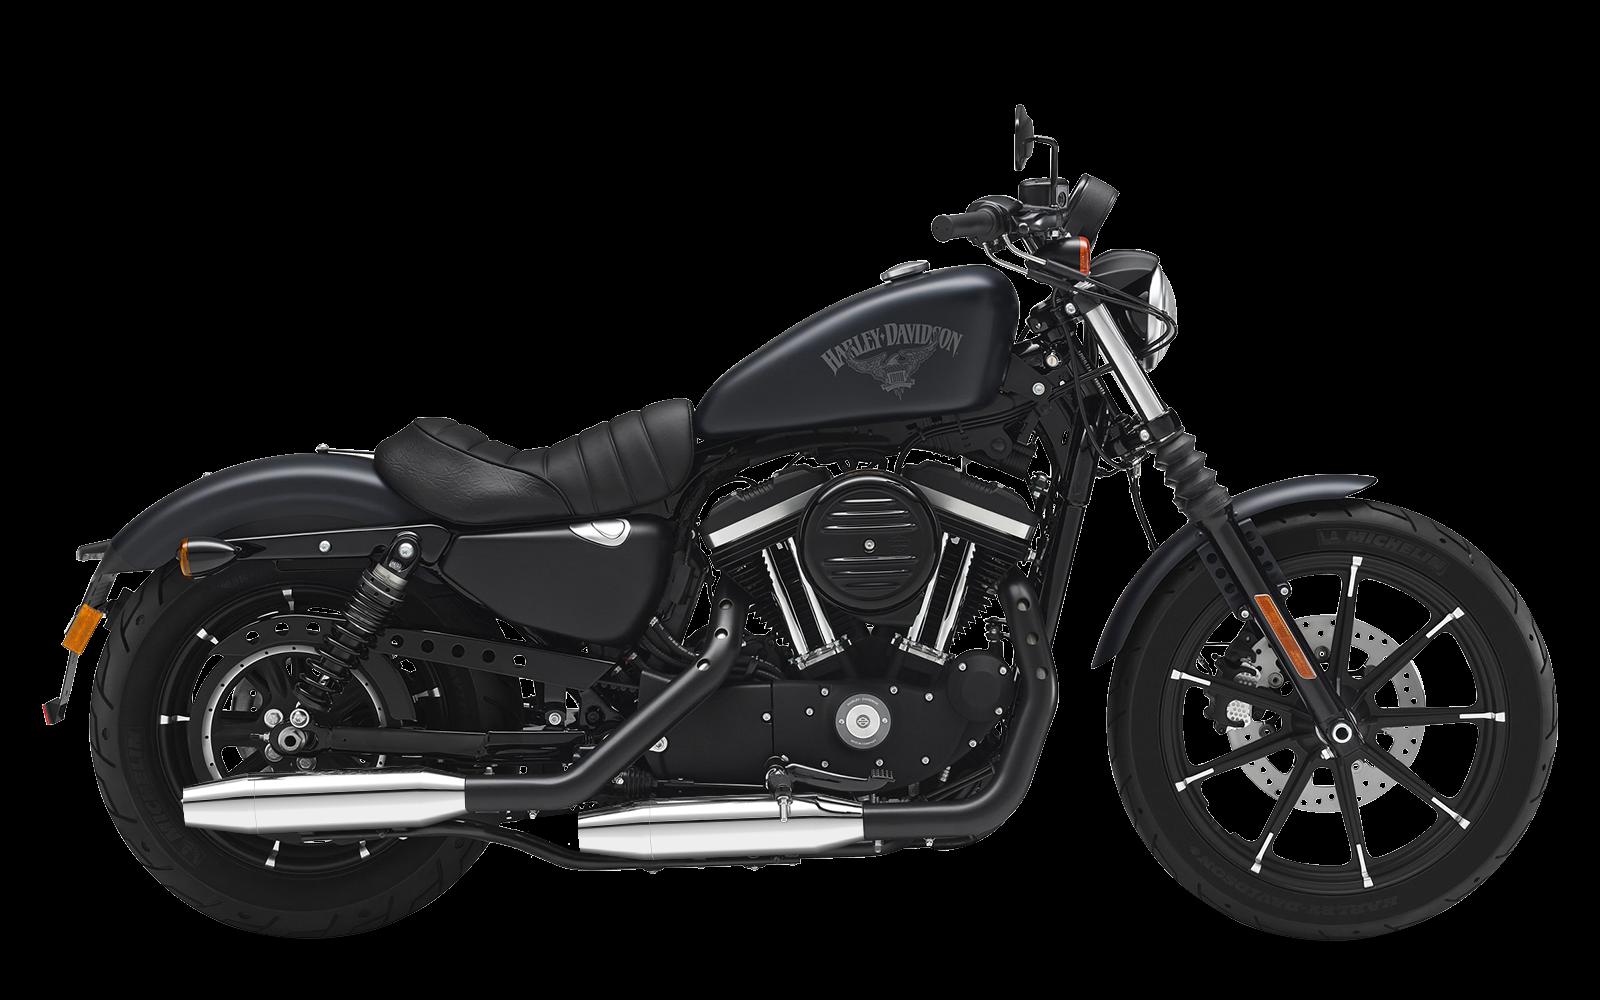 Sportster - Iron 883 - XL - 2014-2016 - Endtöpfe